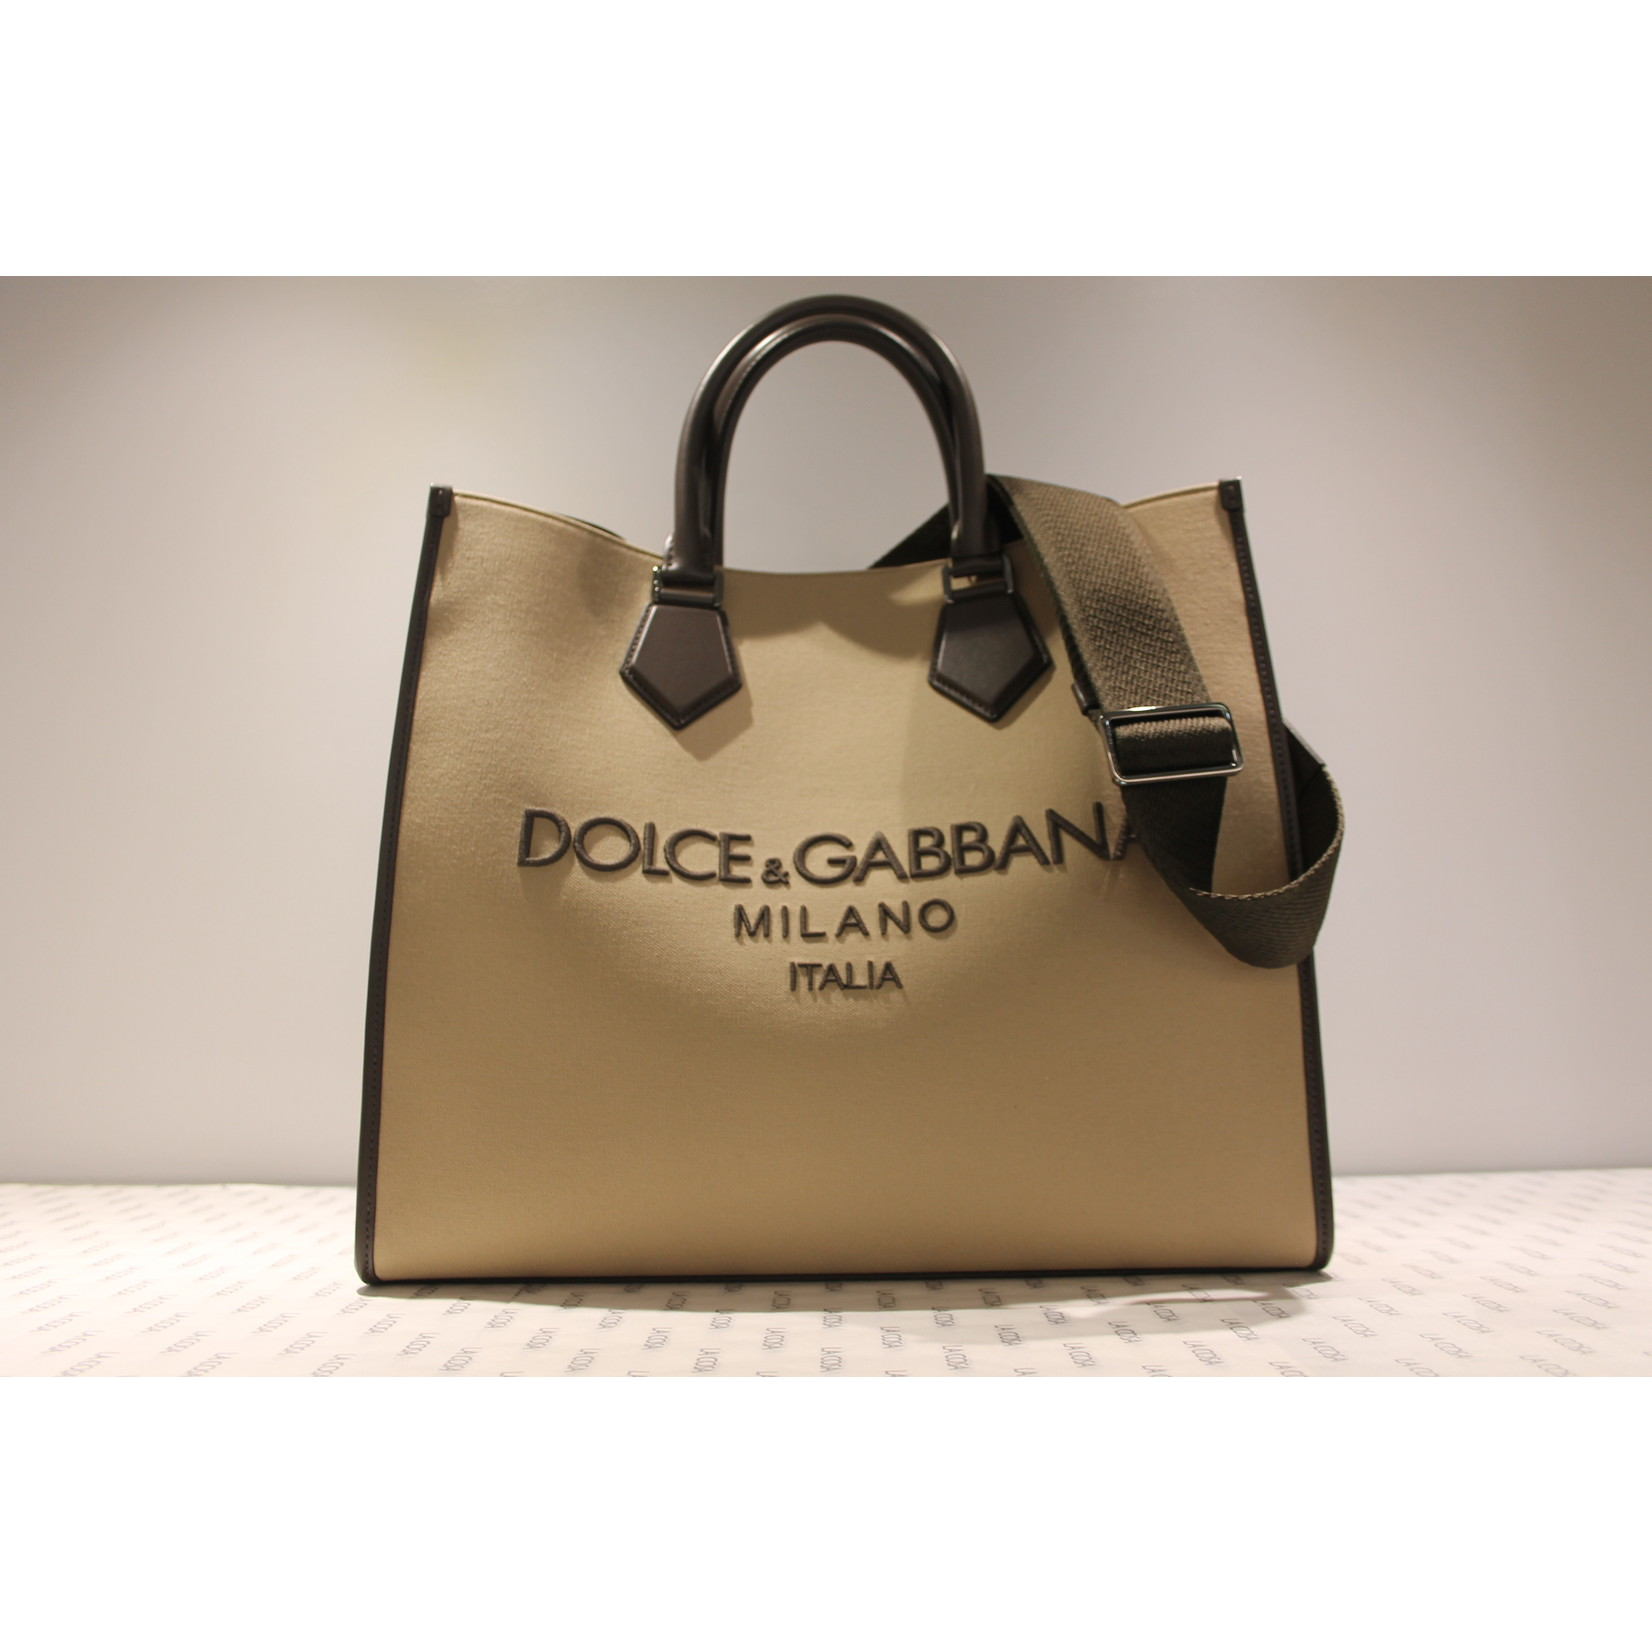 Dolce&Gabbana Tas Tas 42653